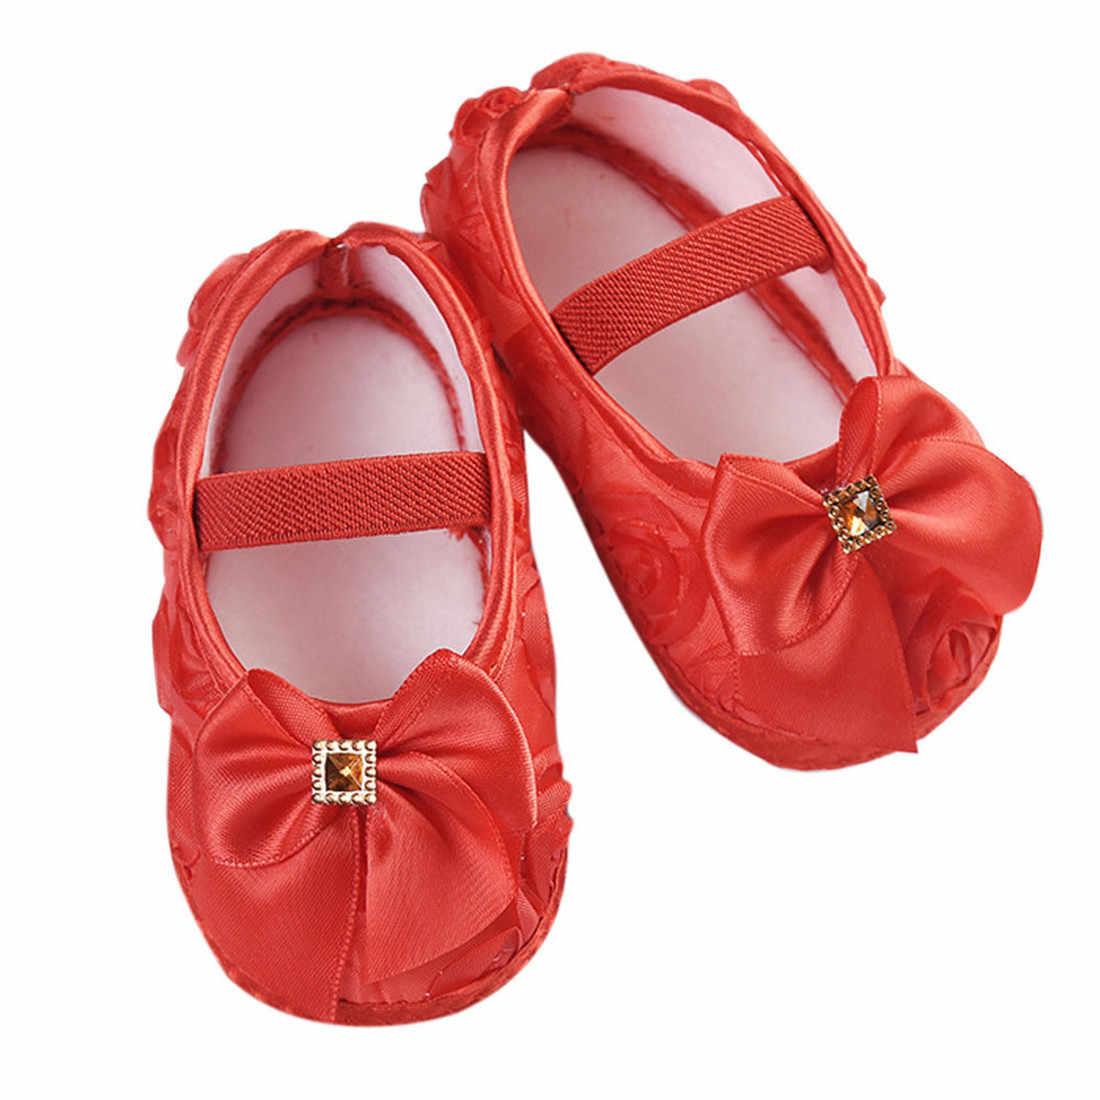 Zapatos bebé niño chico bebé niñas Rosa Bowknot banda elástica de algodón zapatos para recién nacidos zapatos детская обувь